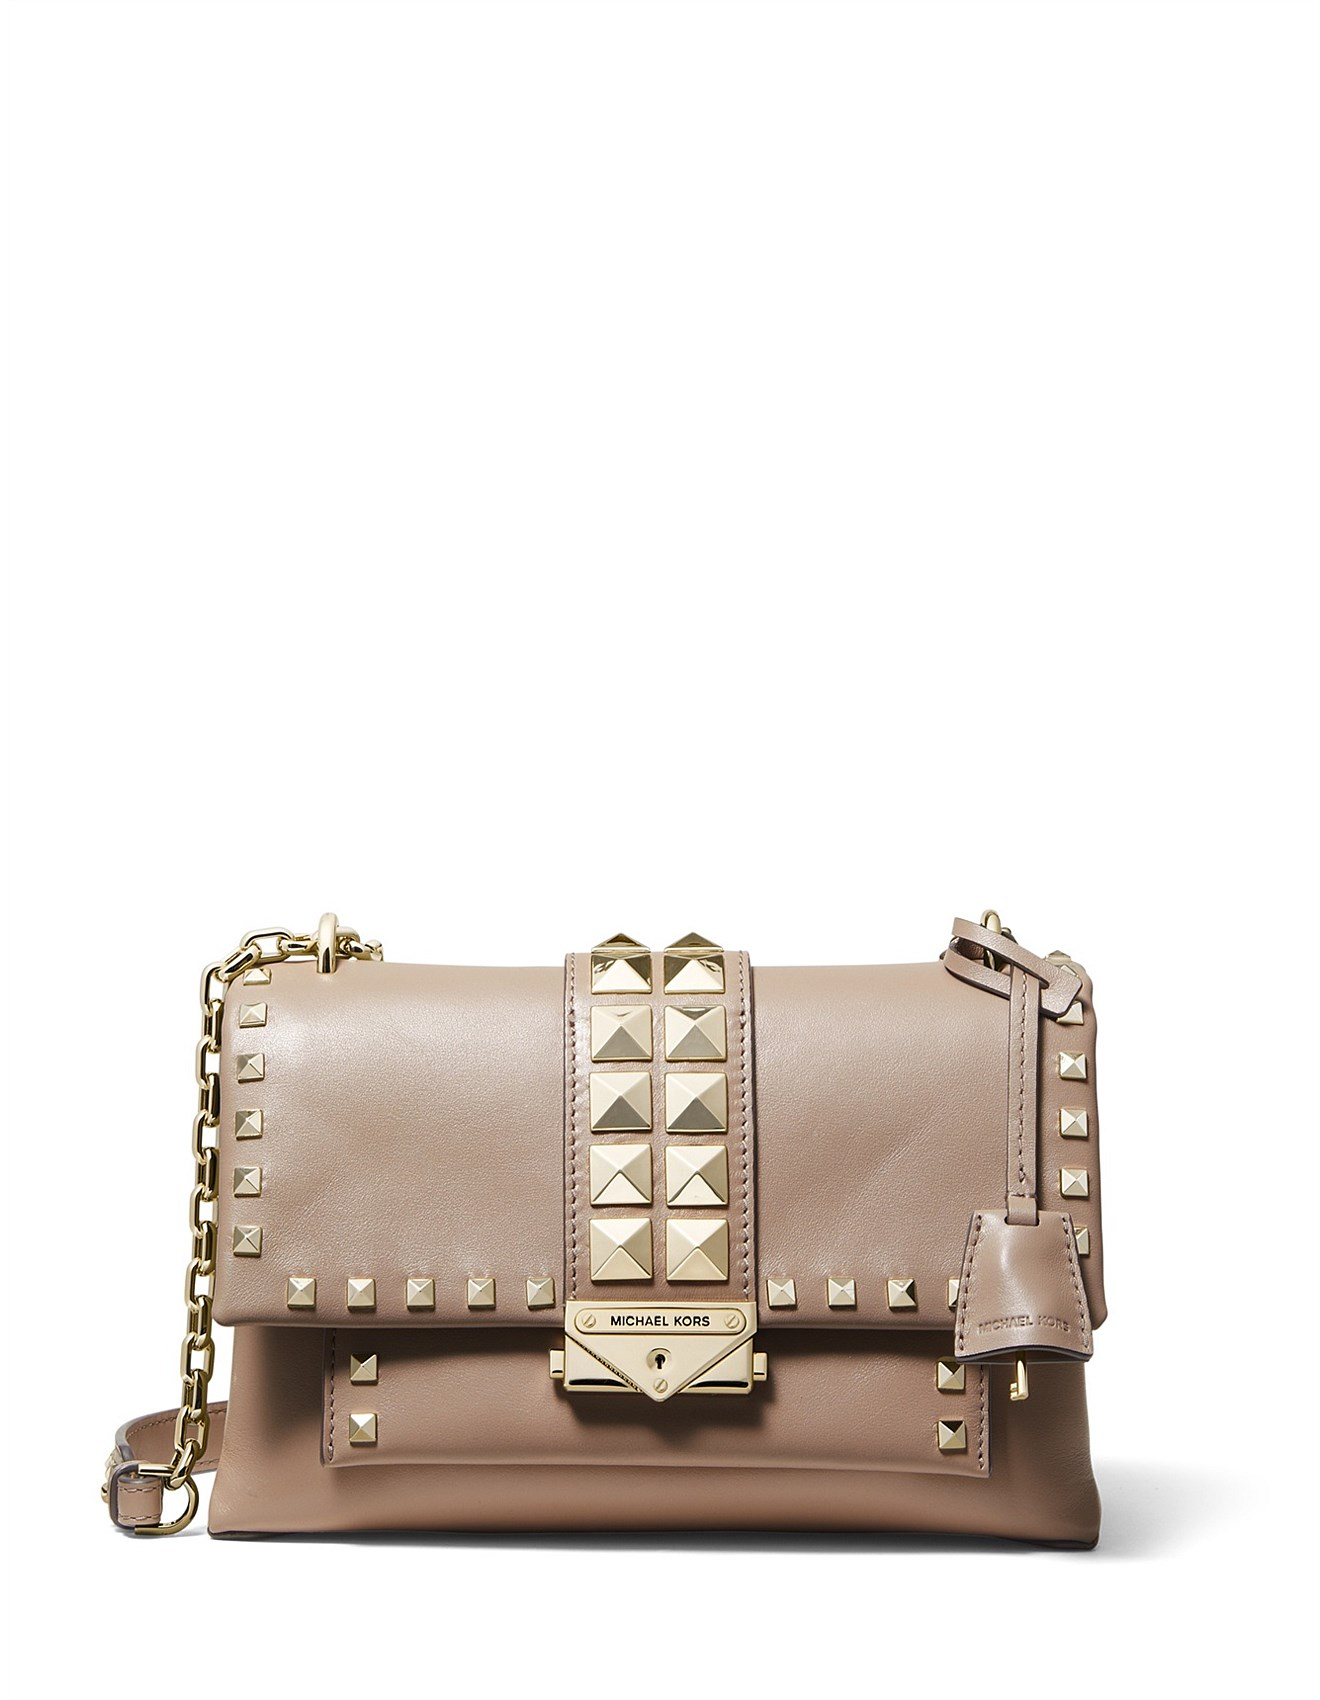 61df9ad8b86b Michael Kors | Handbags, Watches & More Online | David Jones - Cece ...